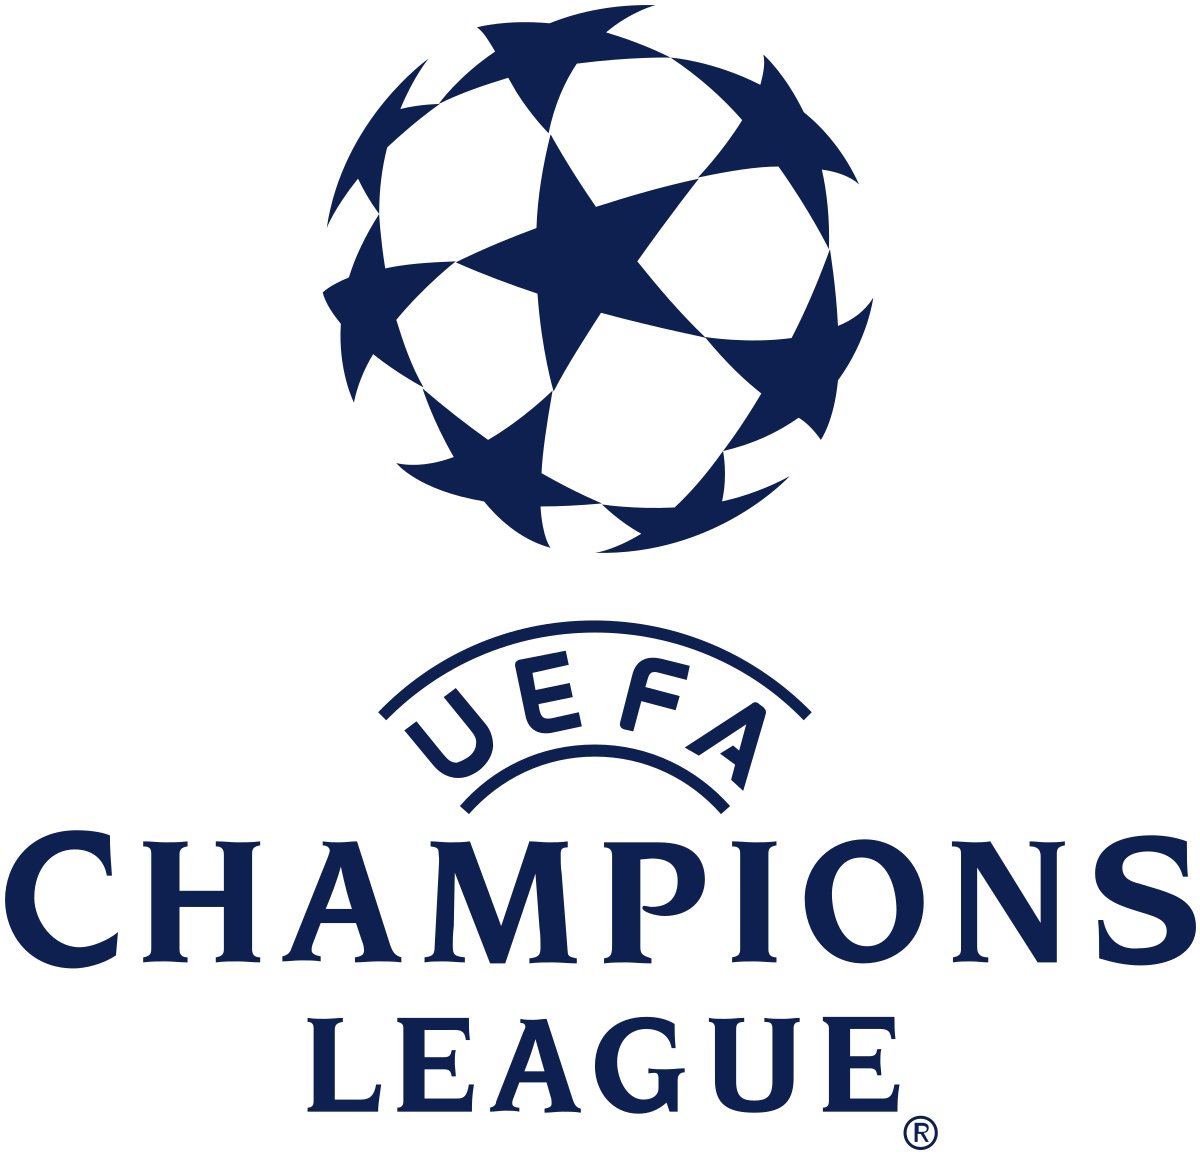 1200x1160 Uefa Champions League